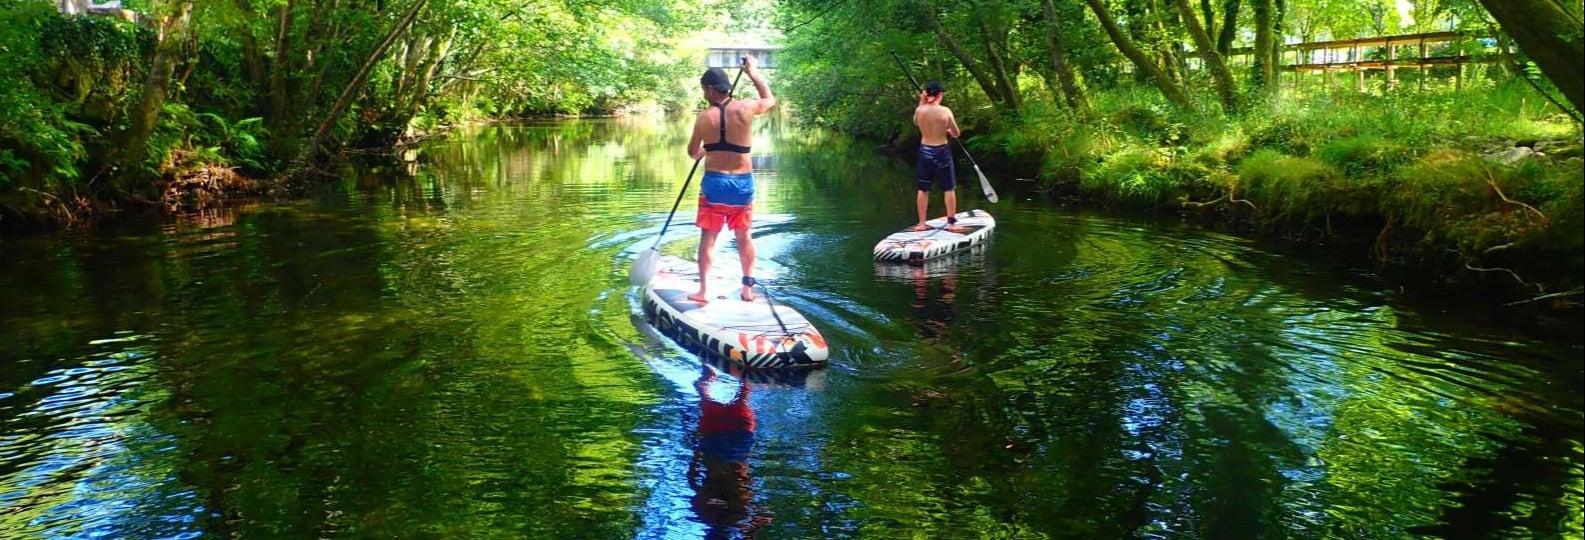 Paddle Surf Tour on Vez River